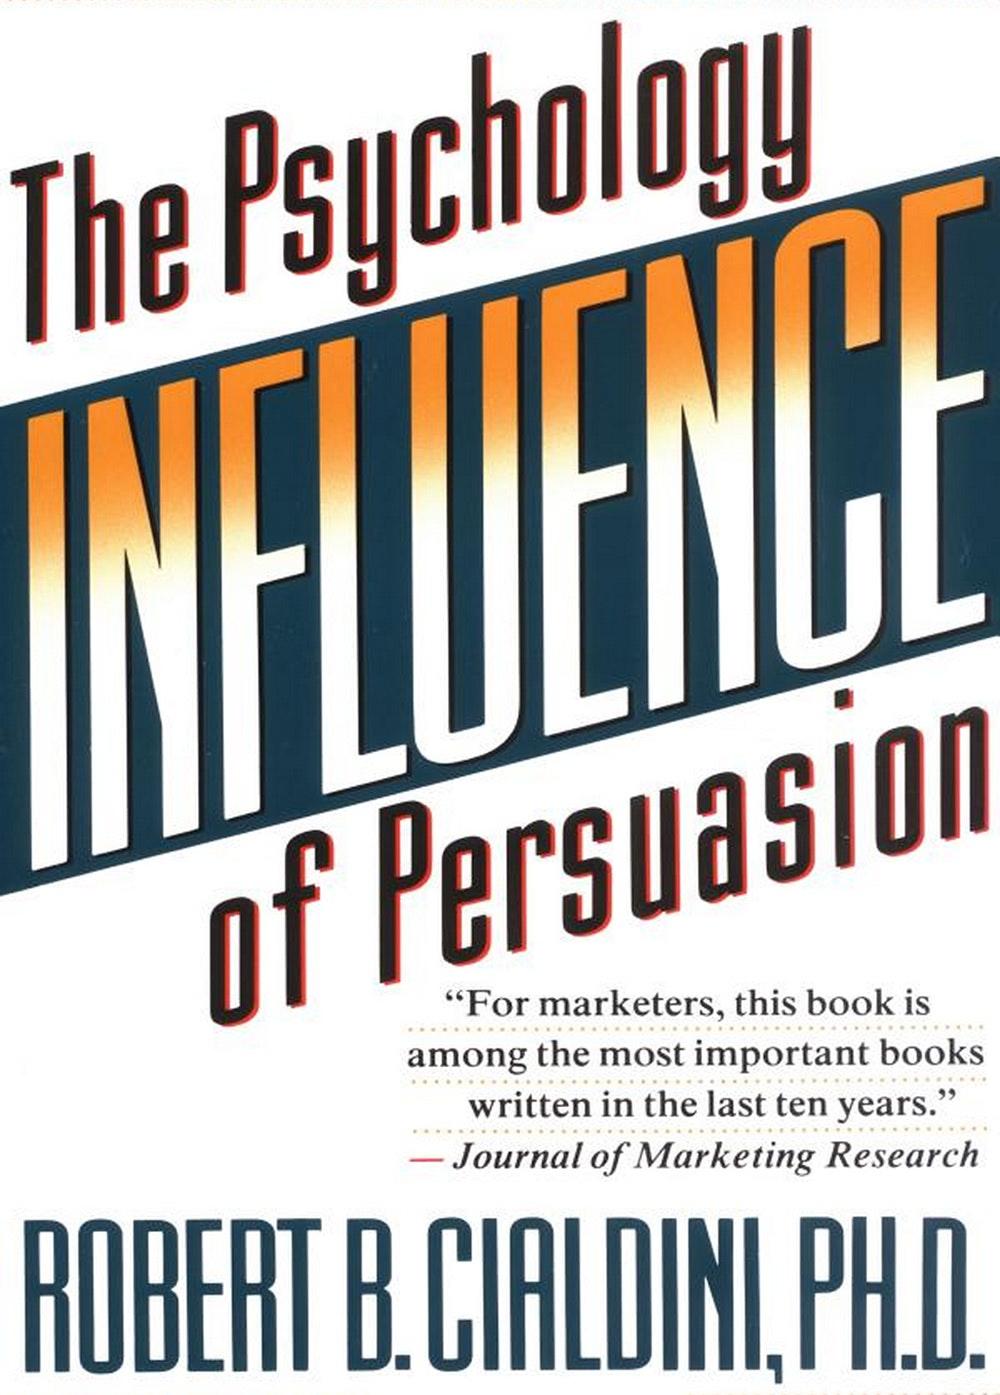 Influence – Robert B. Cialdini, Ph.D